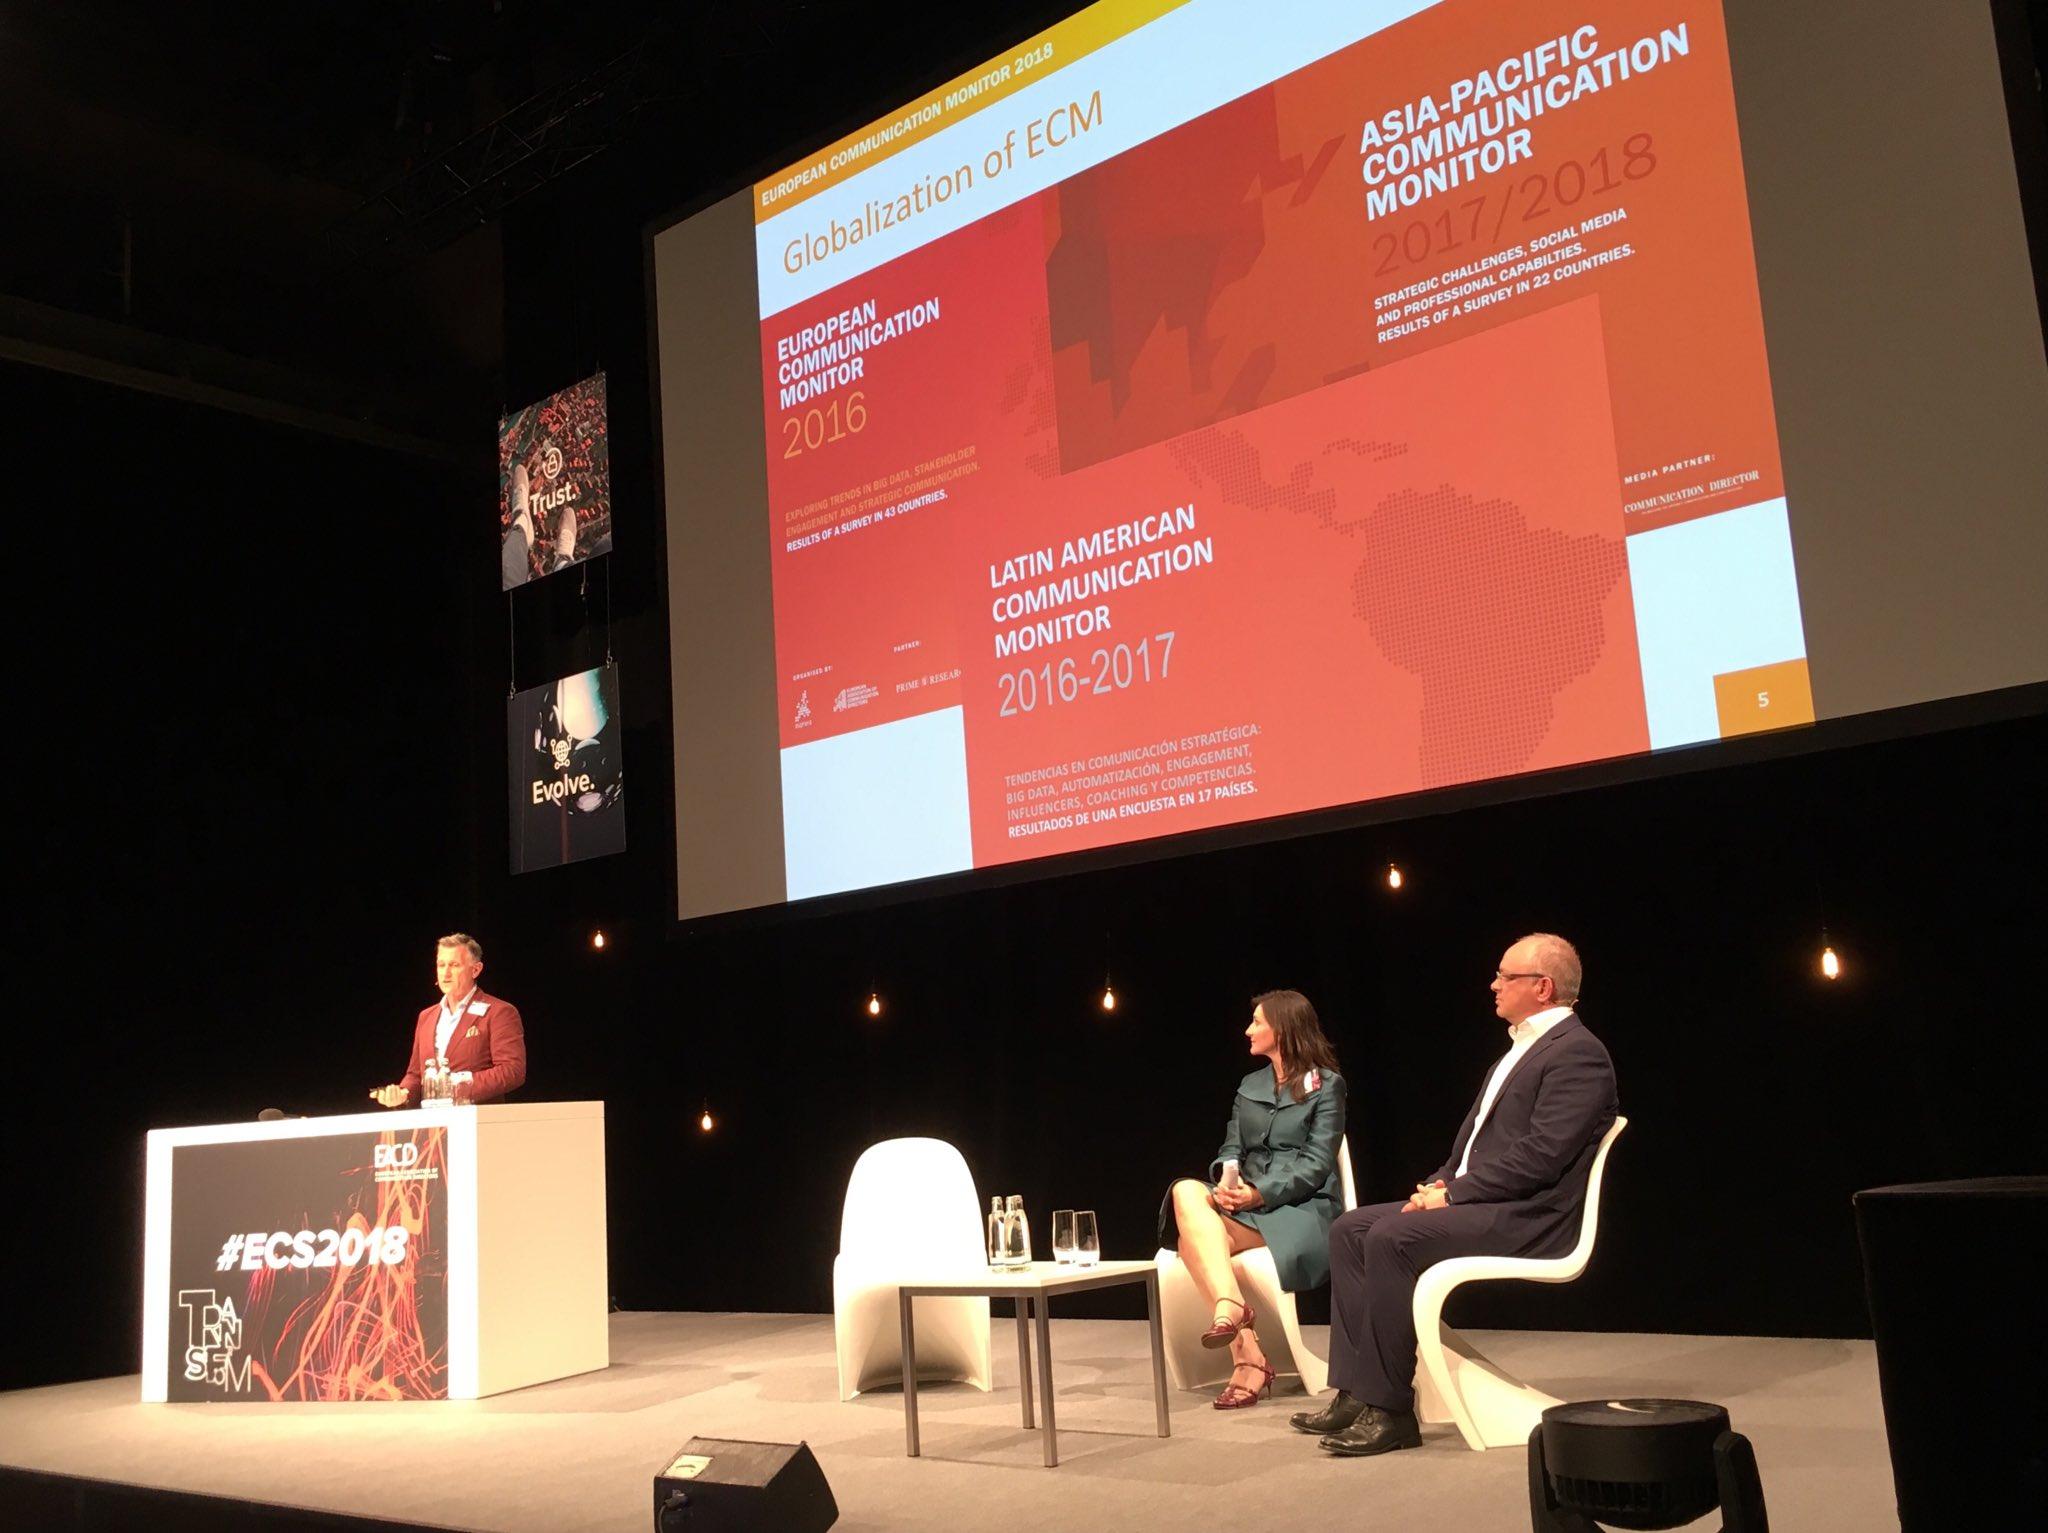 Presentation-European-Communication-Monitor-2018-ECM18-Summit-P-Verhoeven-A-Moreno-D-Vercic